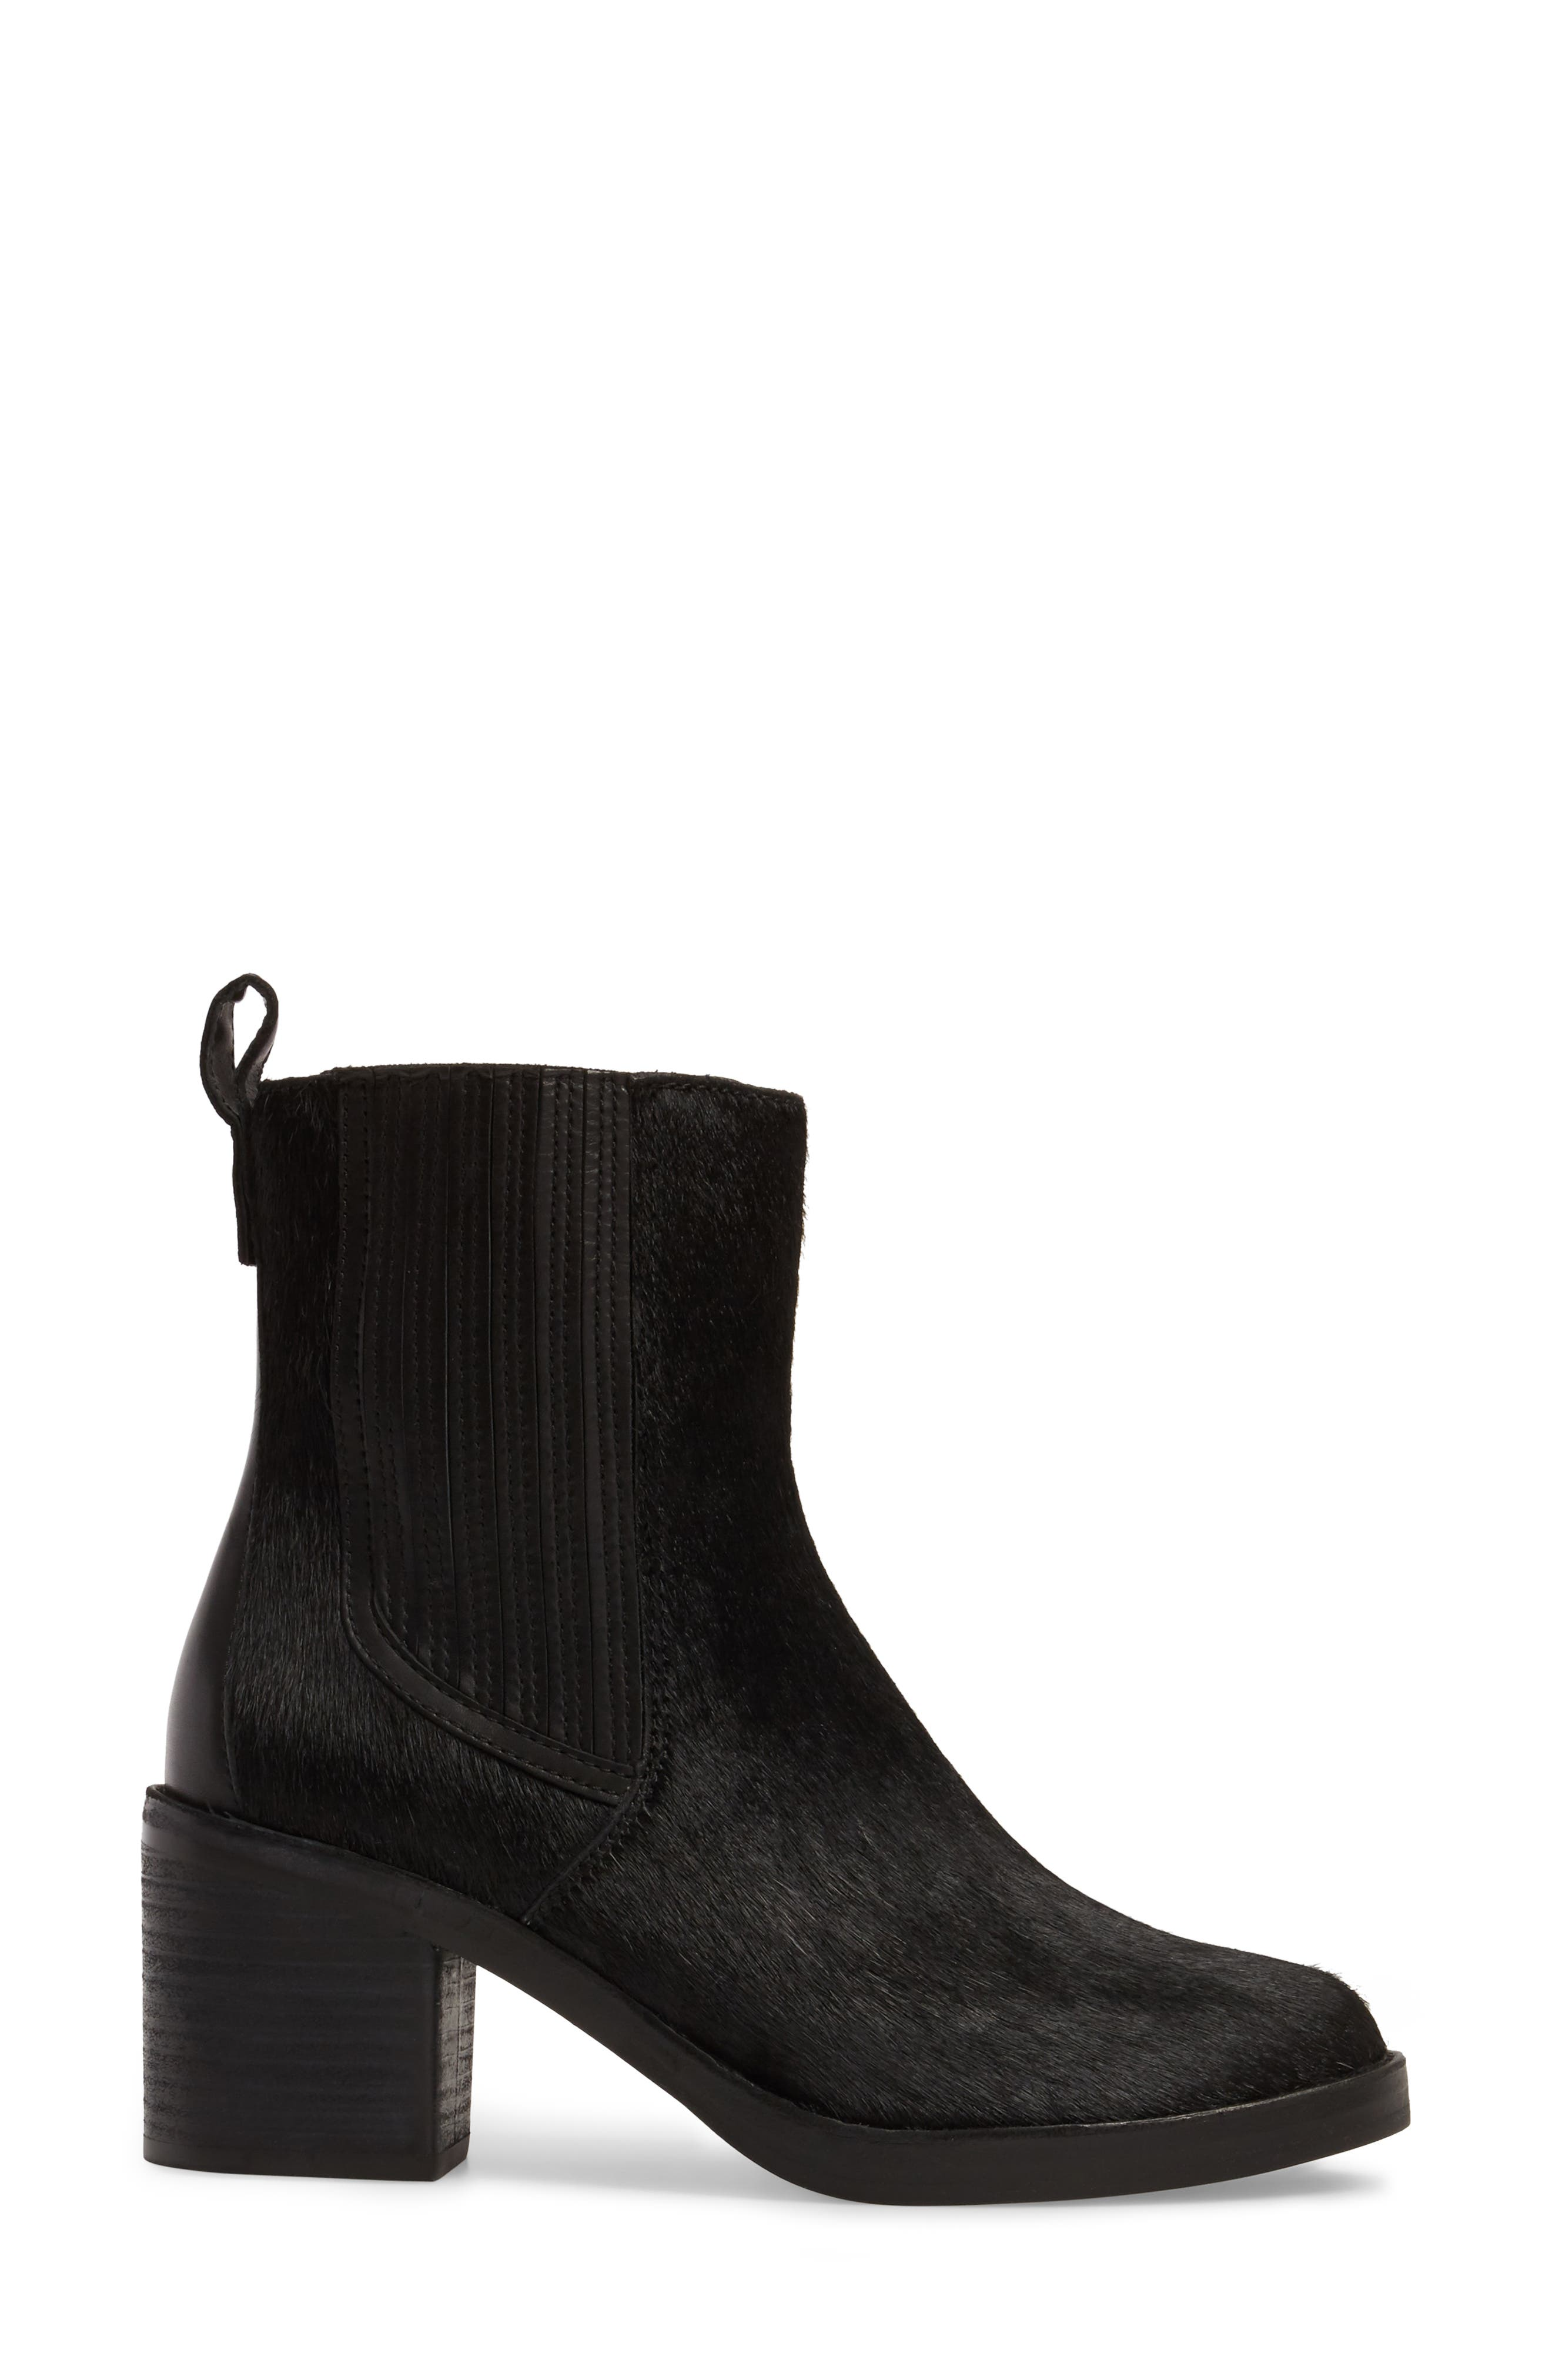 Camden Genuine Calf Hair Chelsea Boot,                             Alternate thumbnail 3, color,                             Black Calf Hair Leather